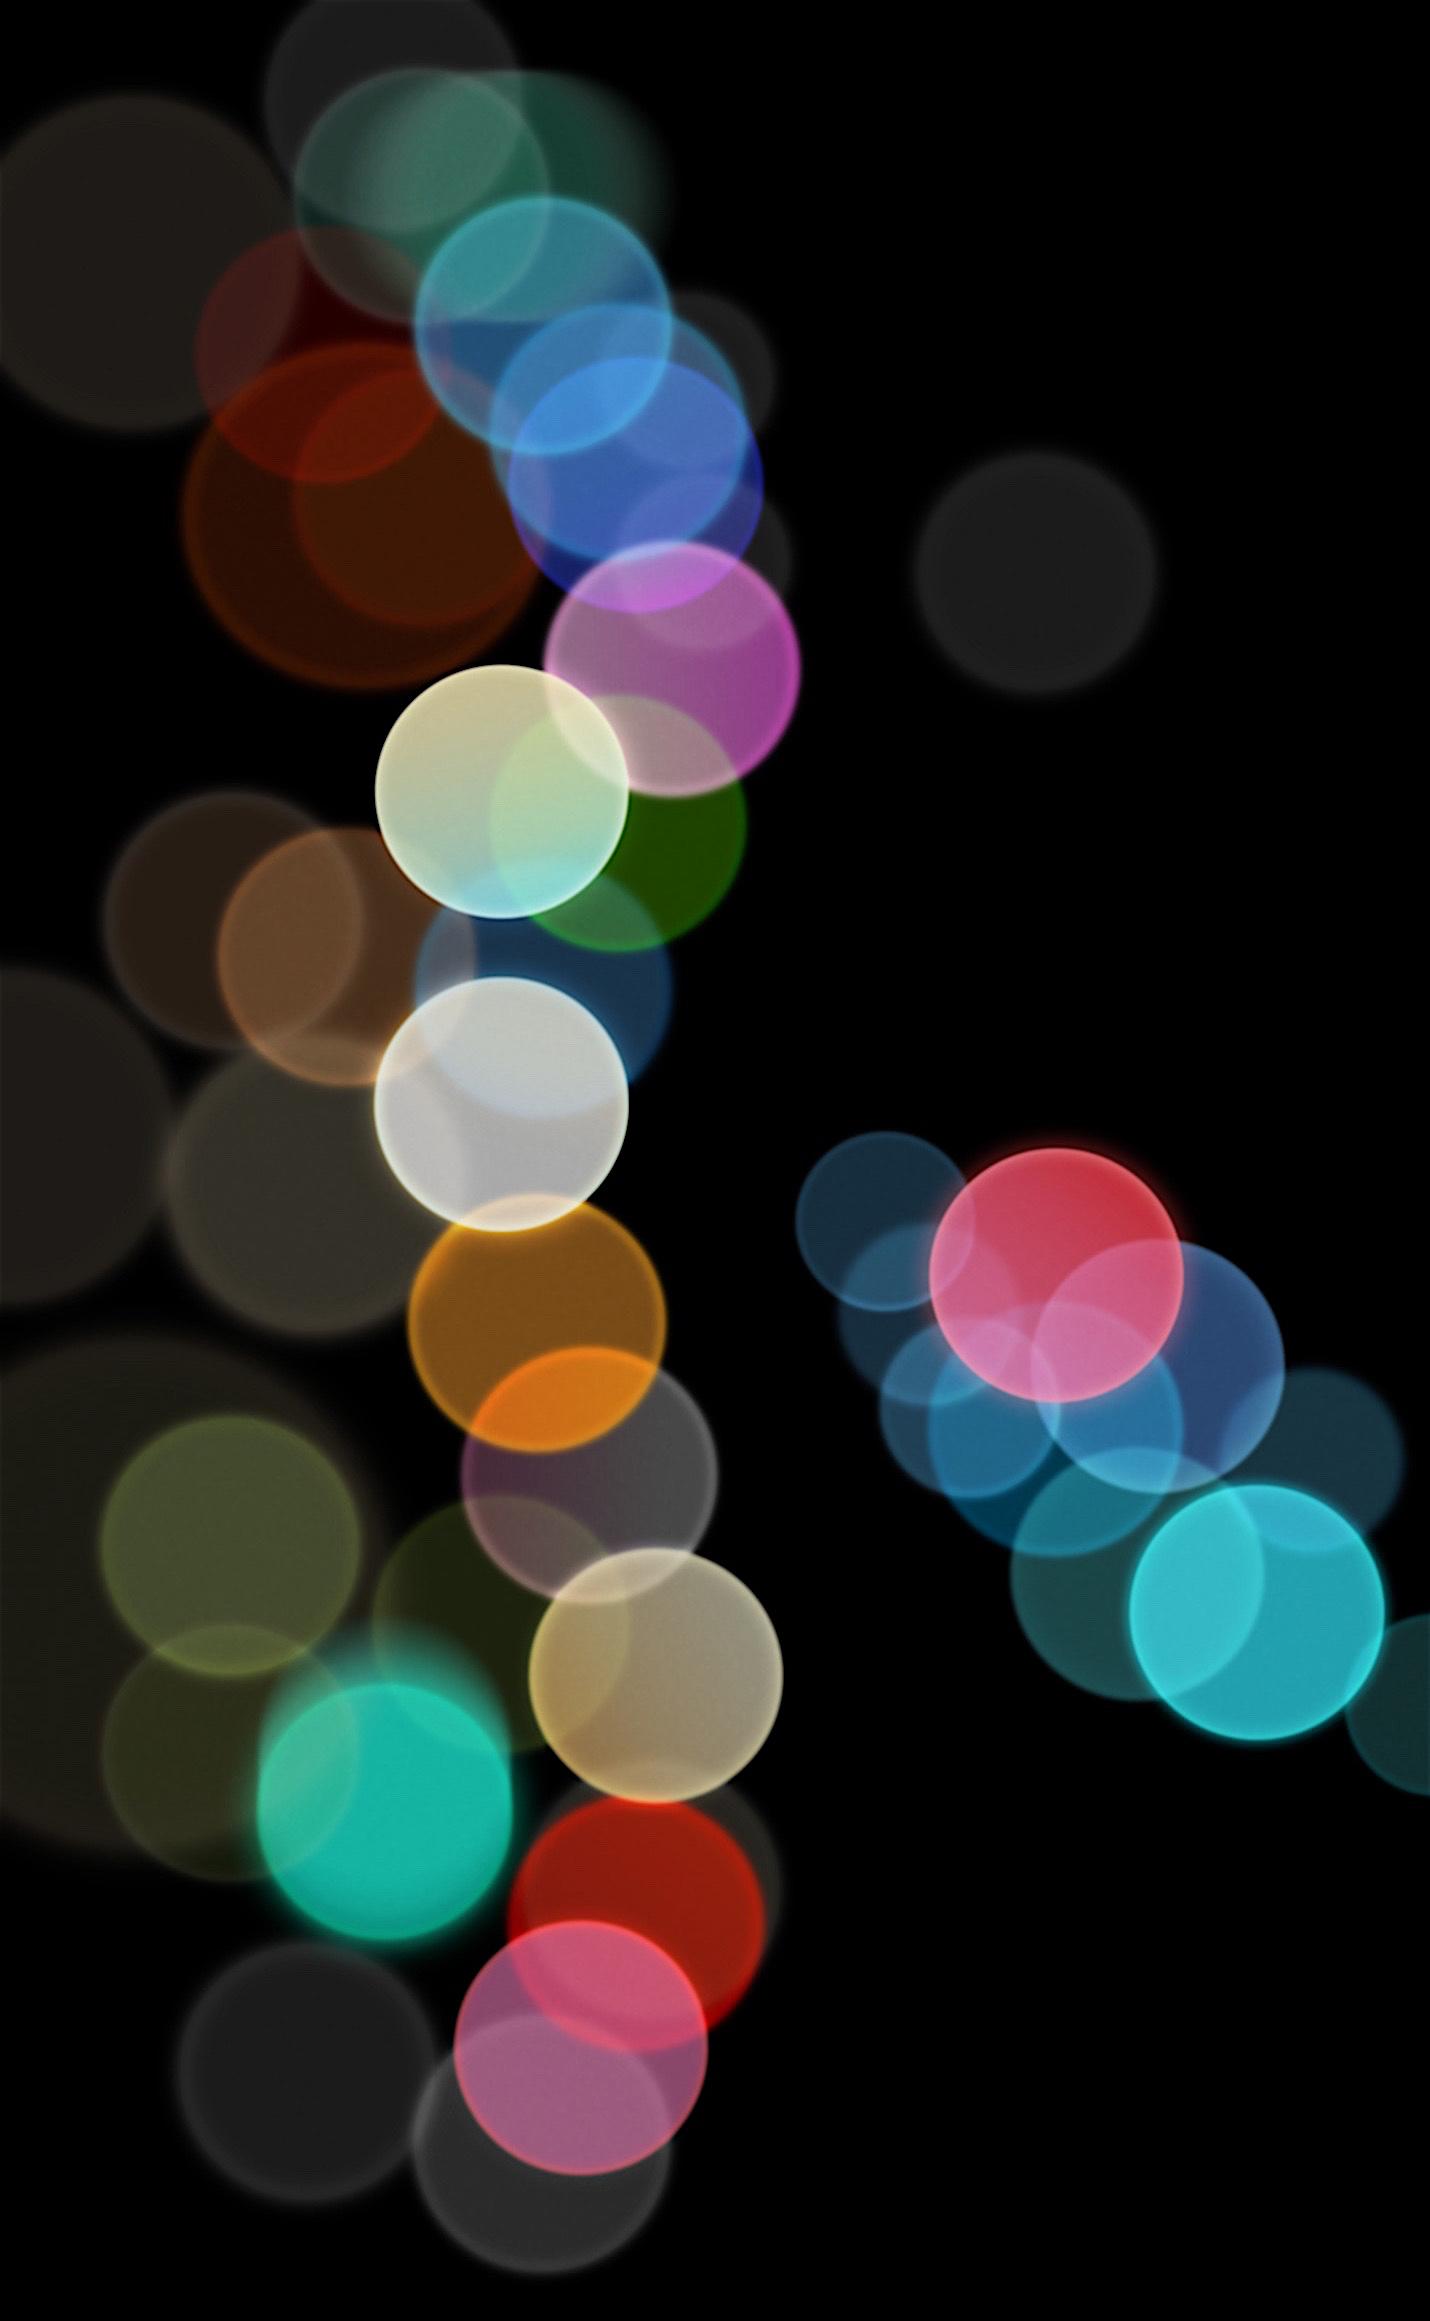 Apple Sept 7 2016 Event Iphone Wallpaper Iphone Wallpaper New 7 1430x2321 Download Hd Wallpaper Wallpapertip